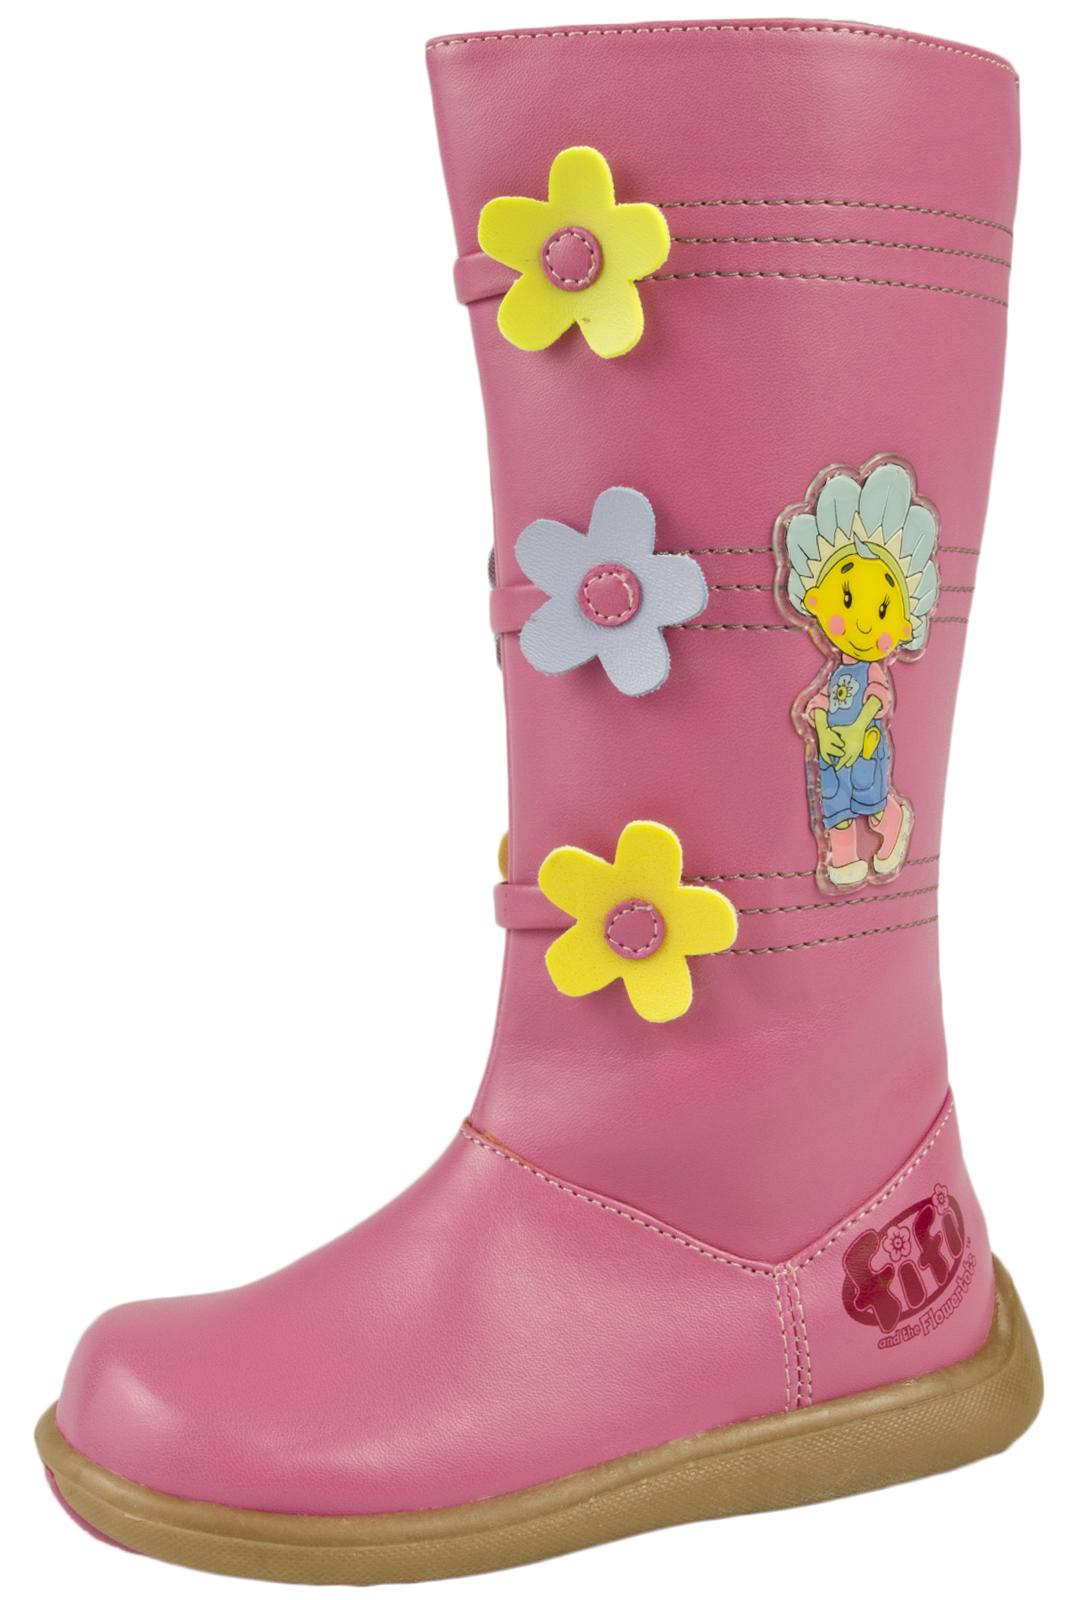 Girls fifi and the flowertots knee high boots faux leather pink girls fifi and the flowertots knee high boots faux leather pink flower shoes mightylinksfo